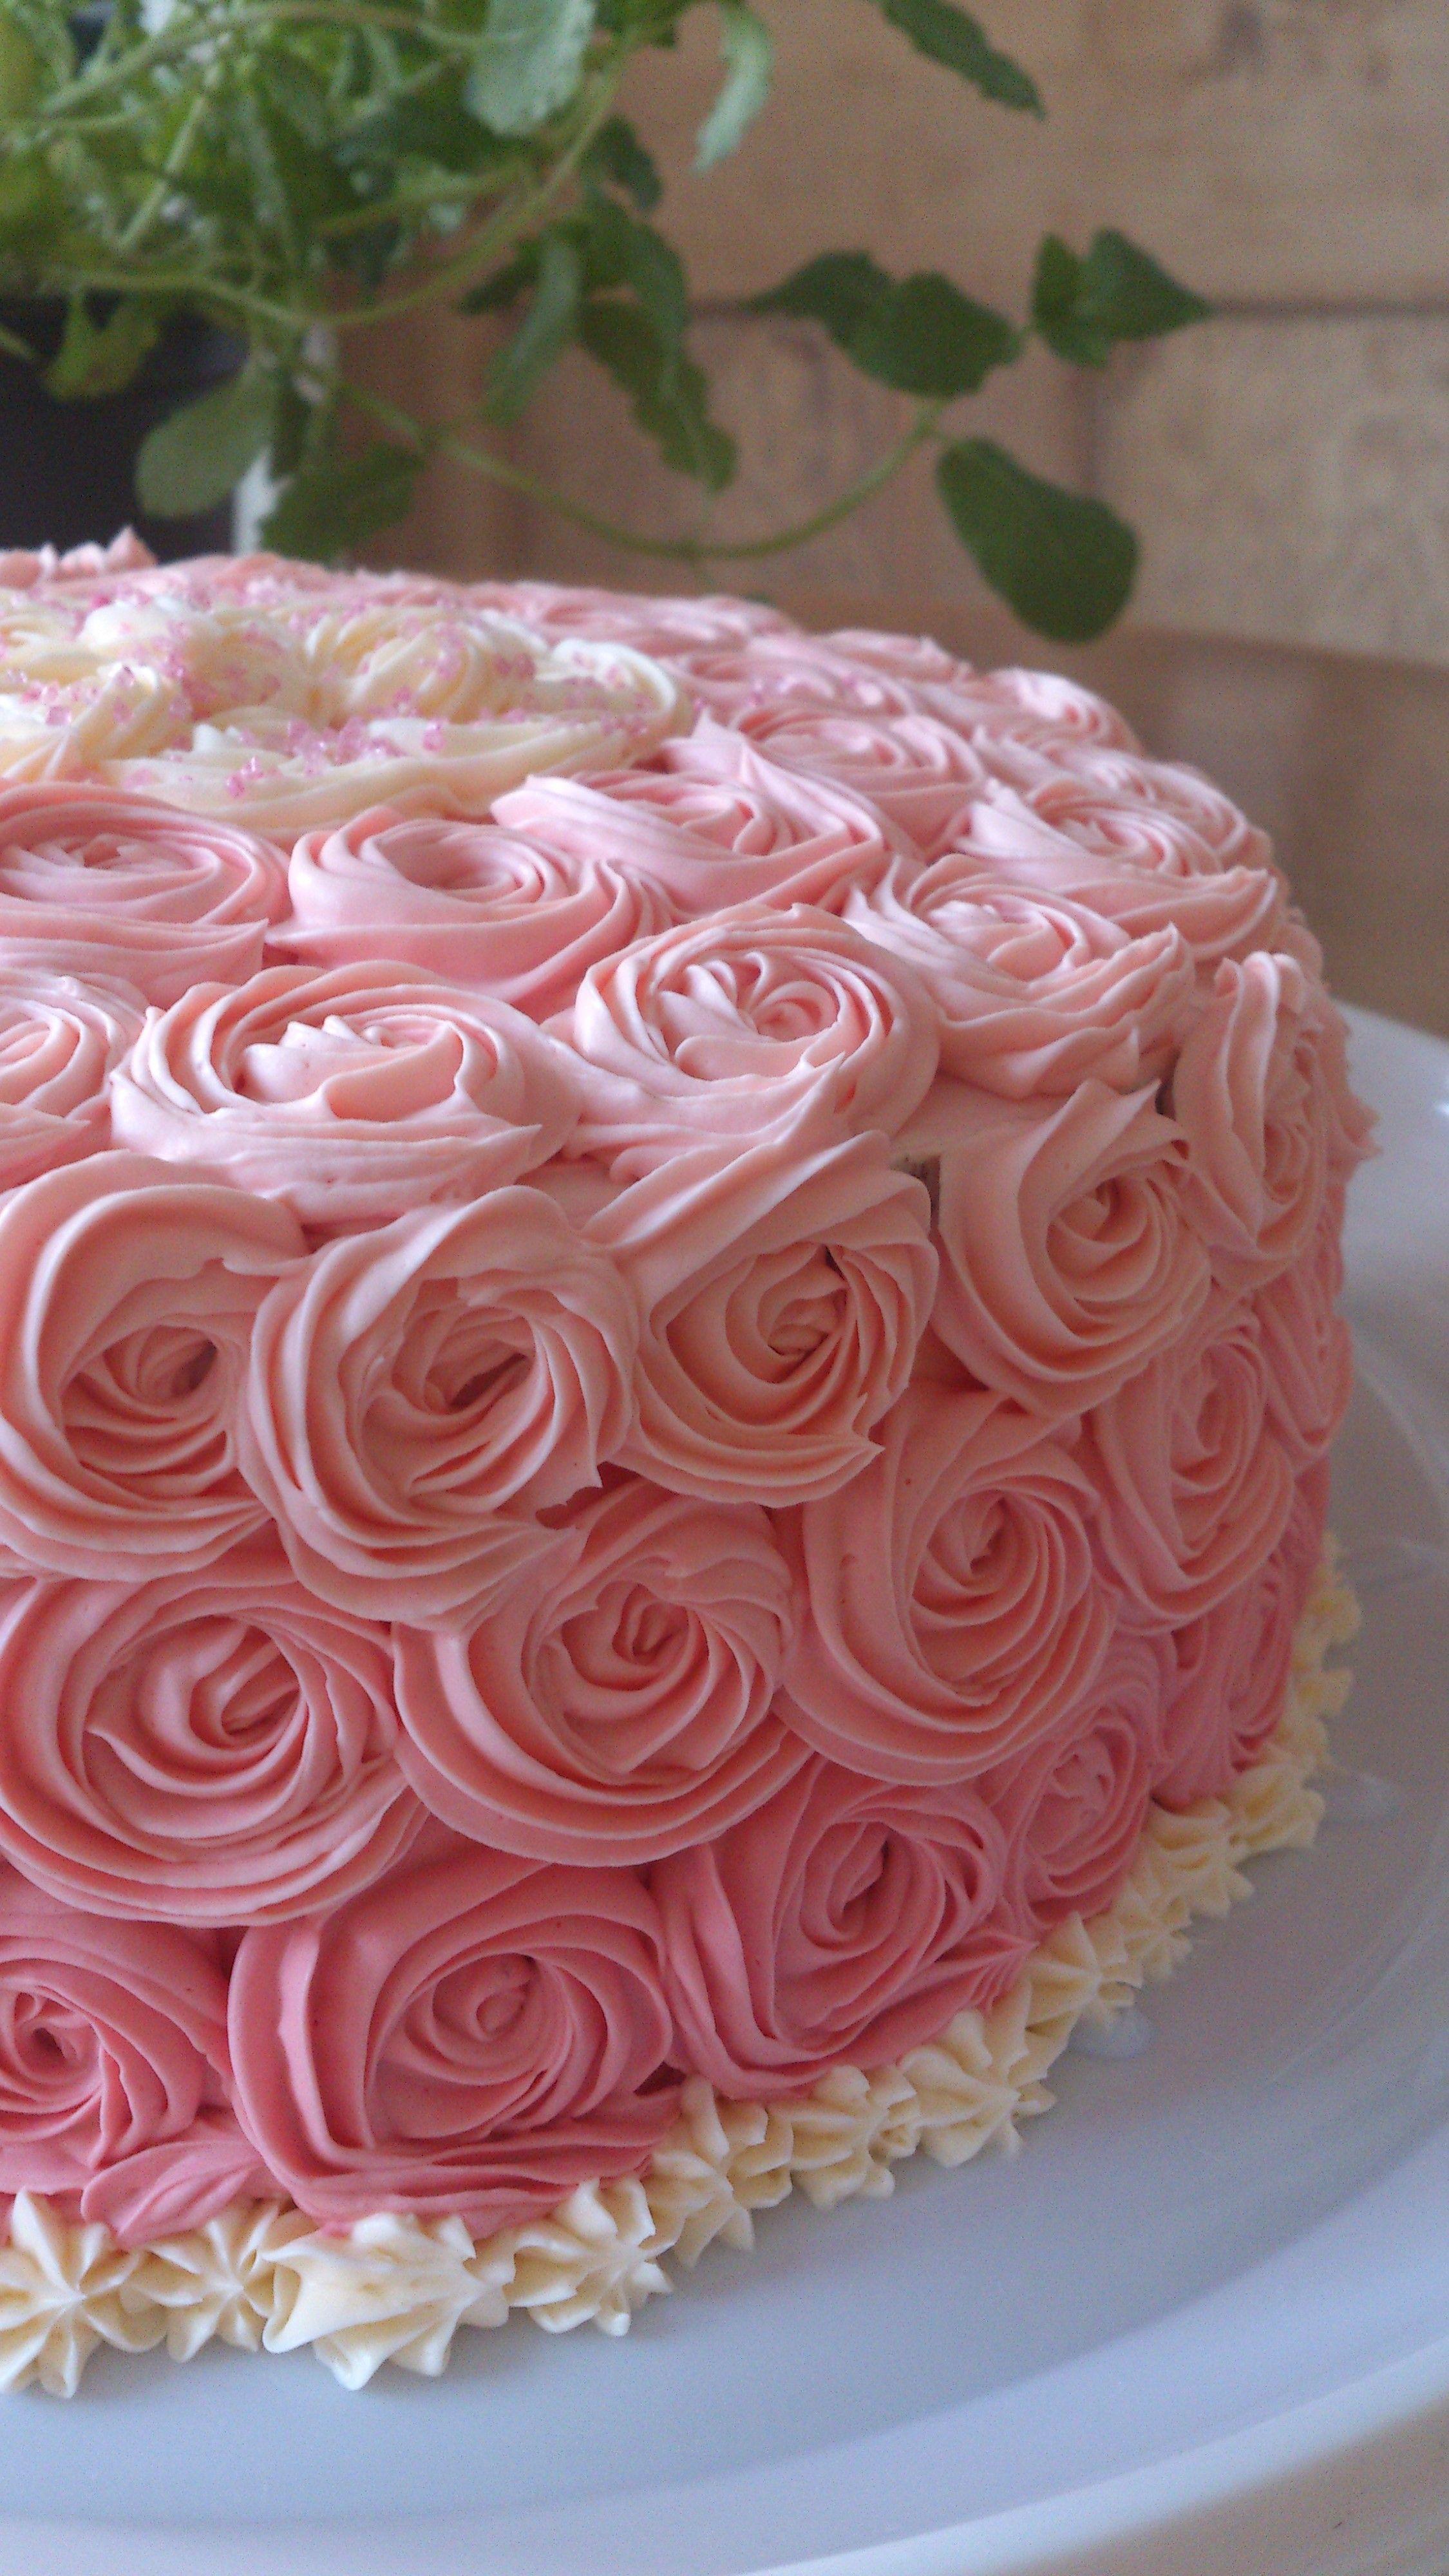 Pink Rose Cake For Birthday 8 Inch Round Birthday Cakes